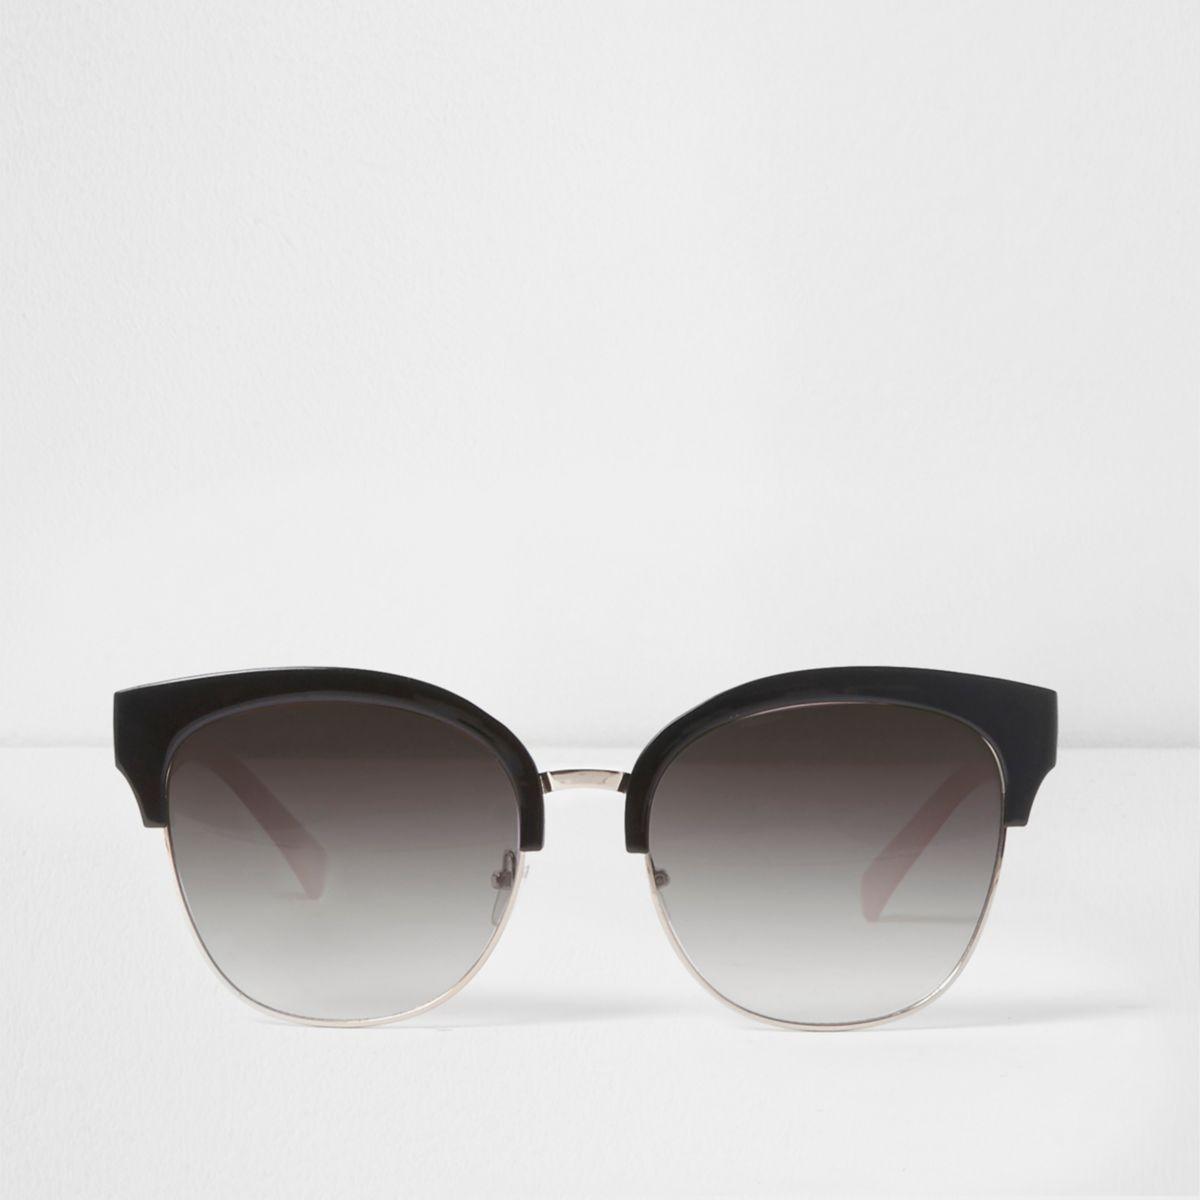 Black oversized half frame retro sunglasses